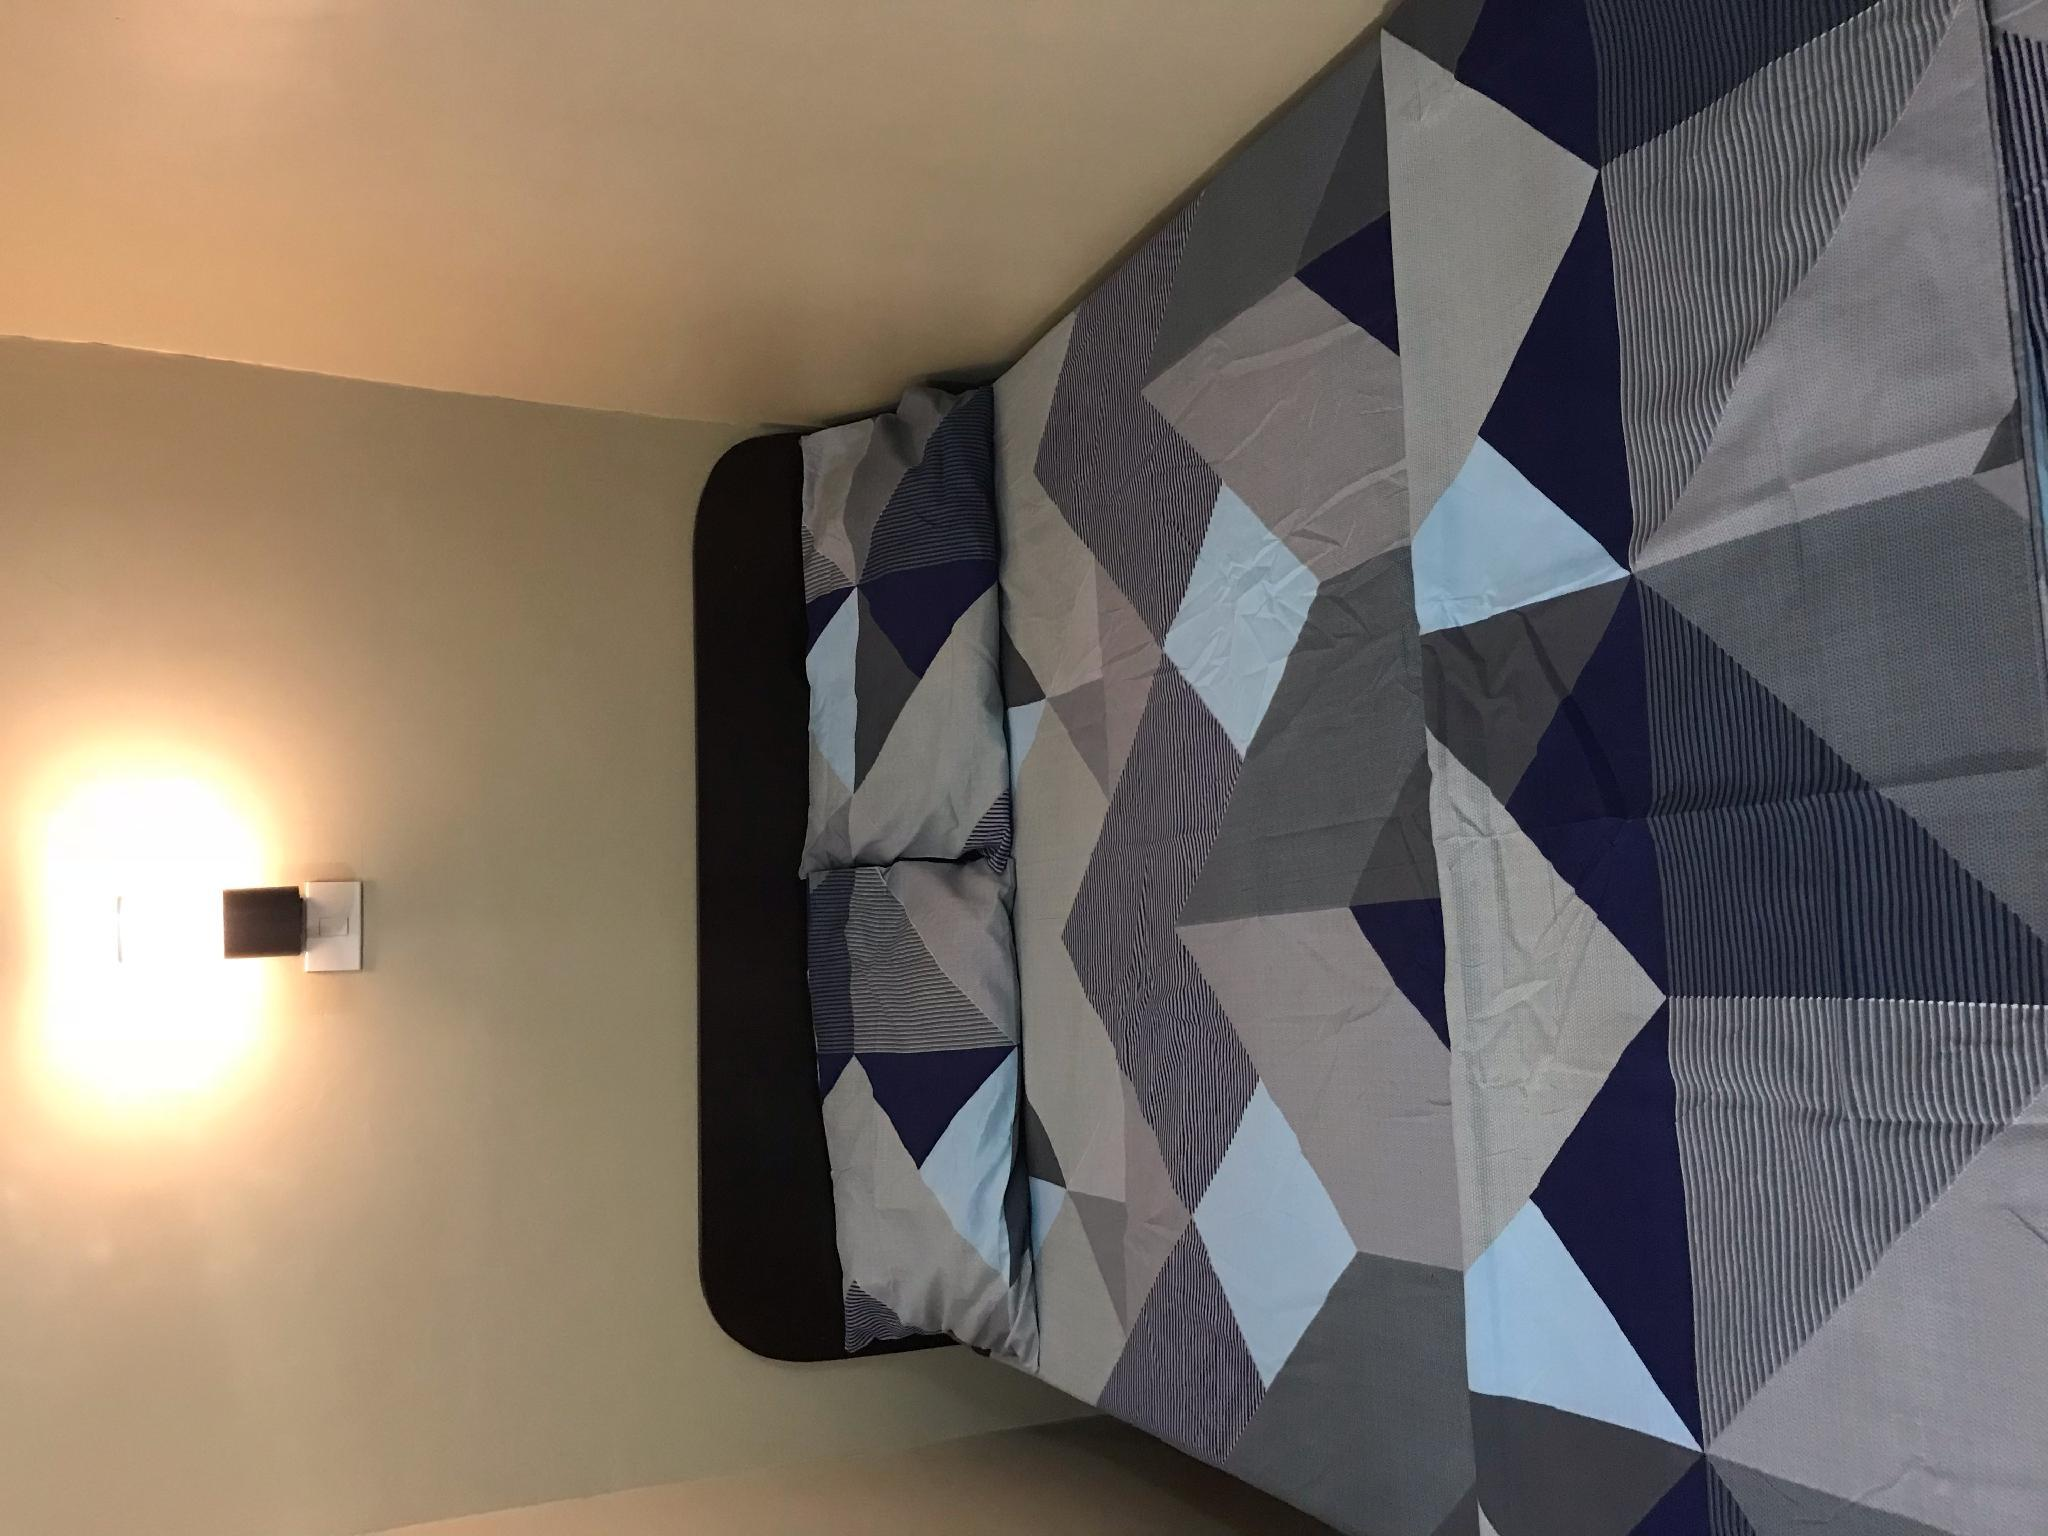 Mikaela's Place Room C